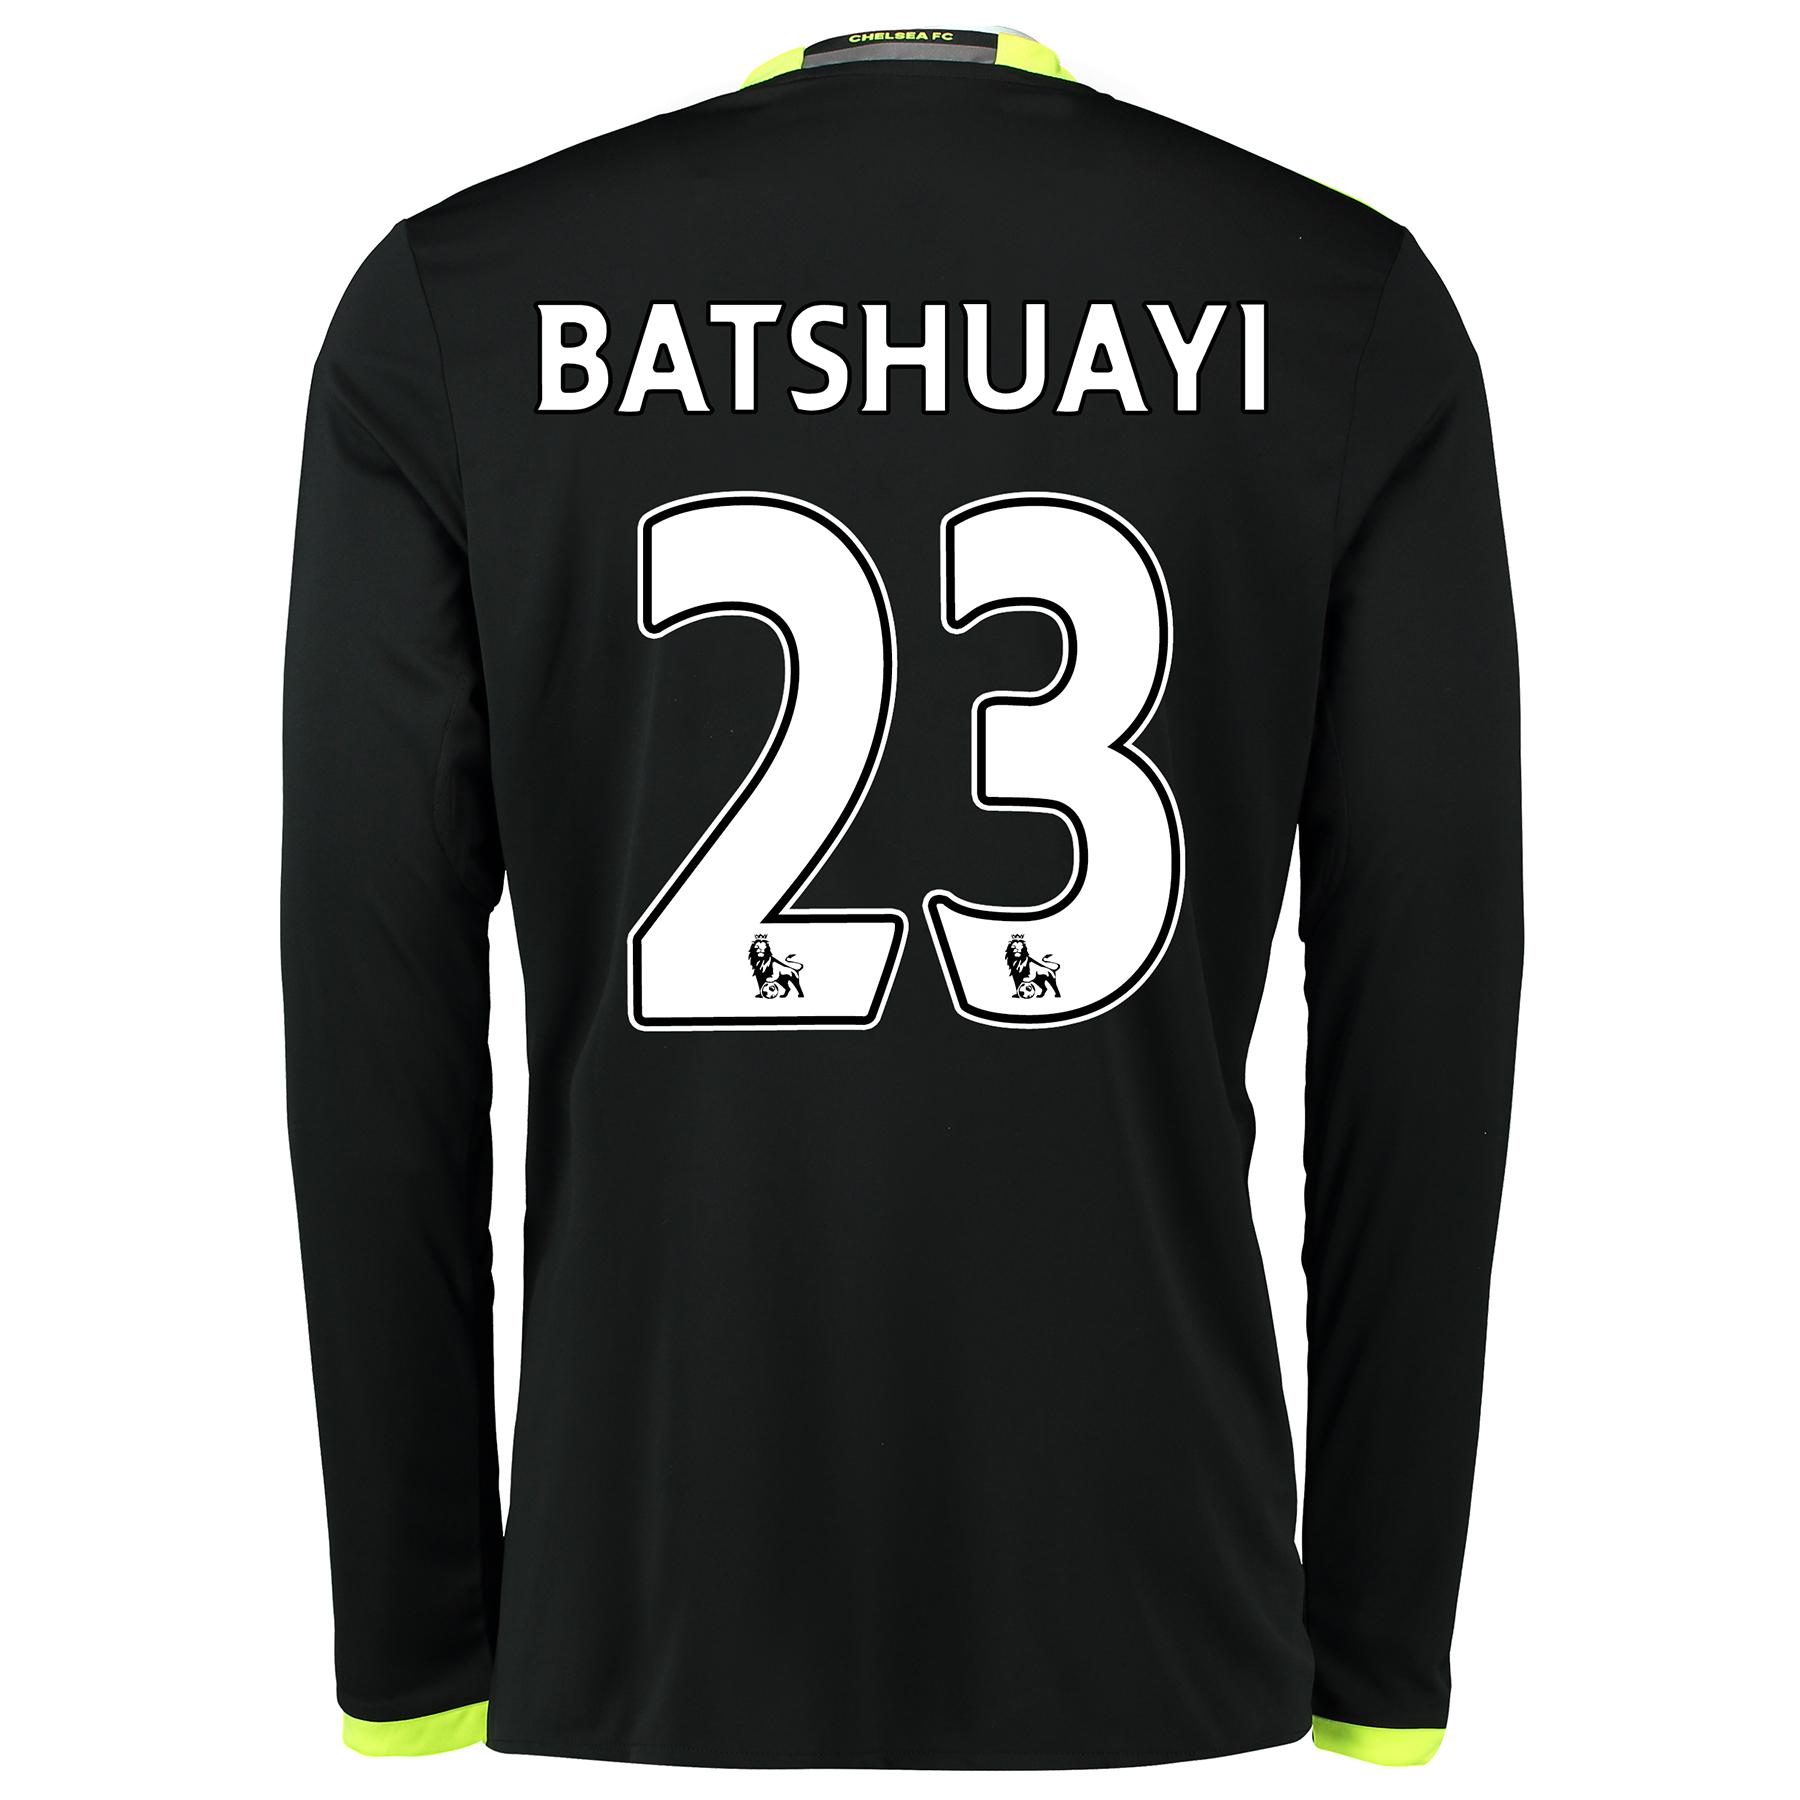 Chelsea Away Shirt 16-17 - Long Sleeve with Batshuayi 23 printing